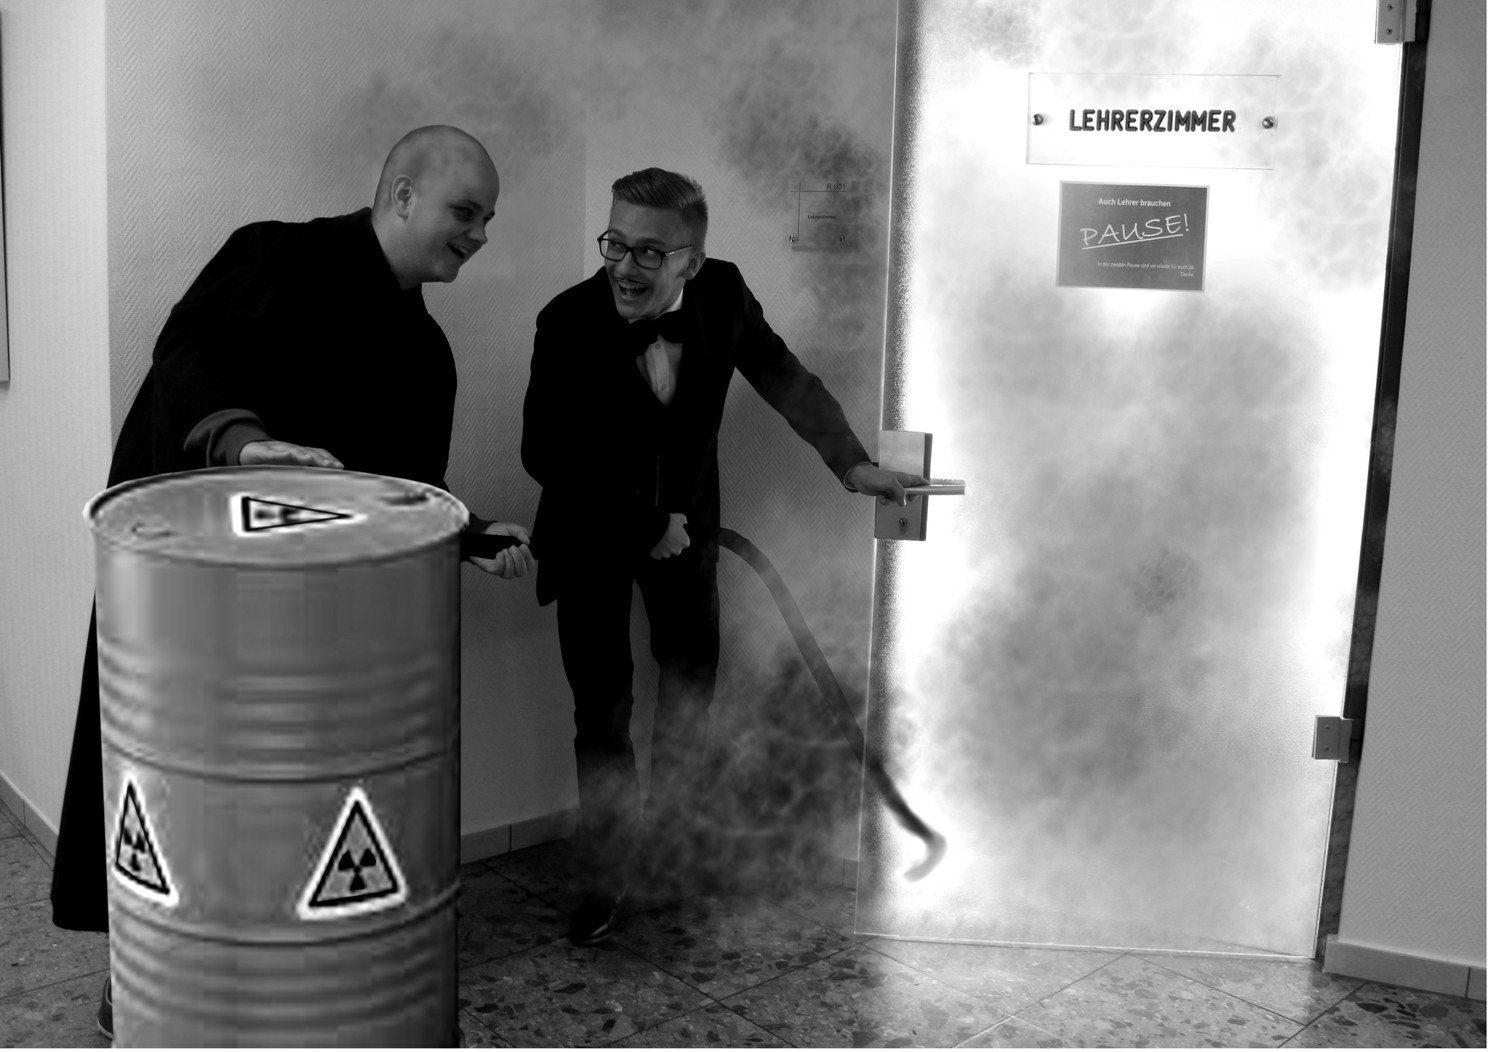 Gomez et Fester bidon nucléaire Lehrerzimmer